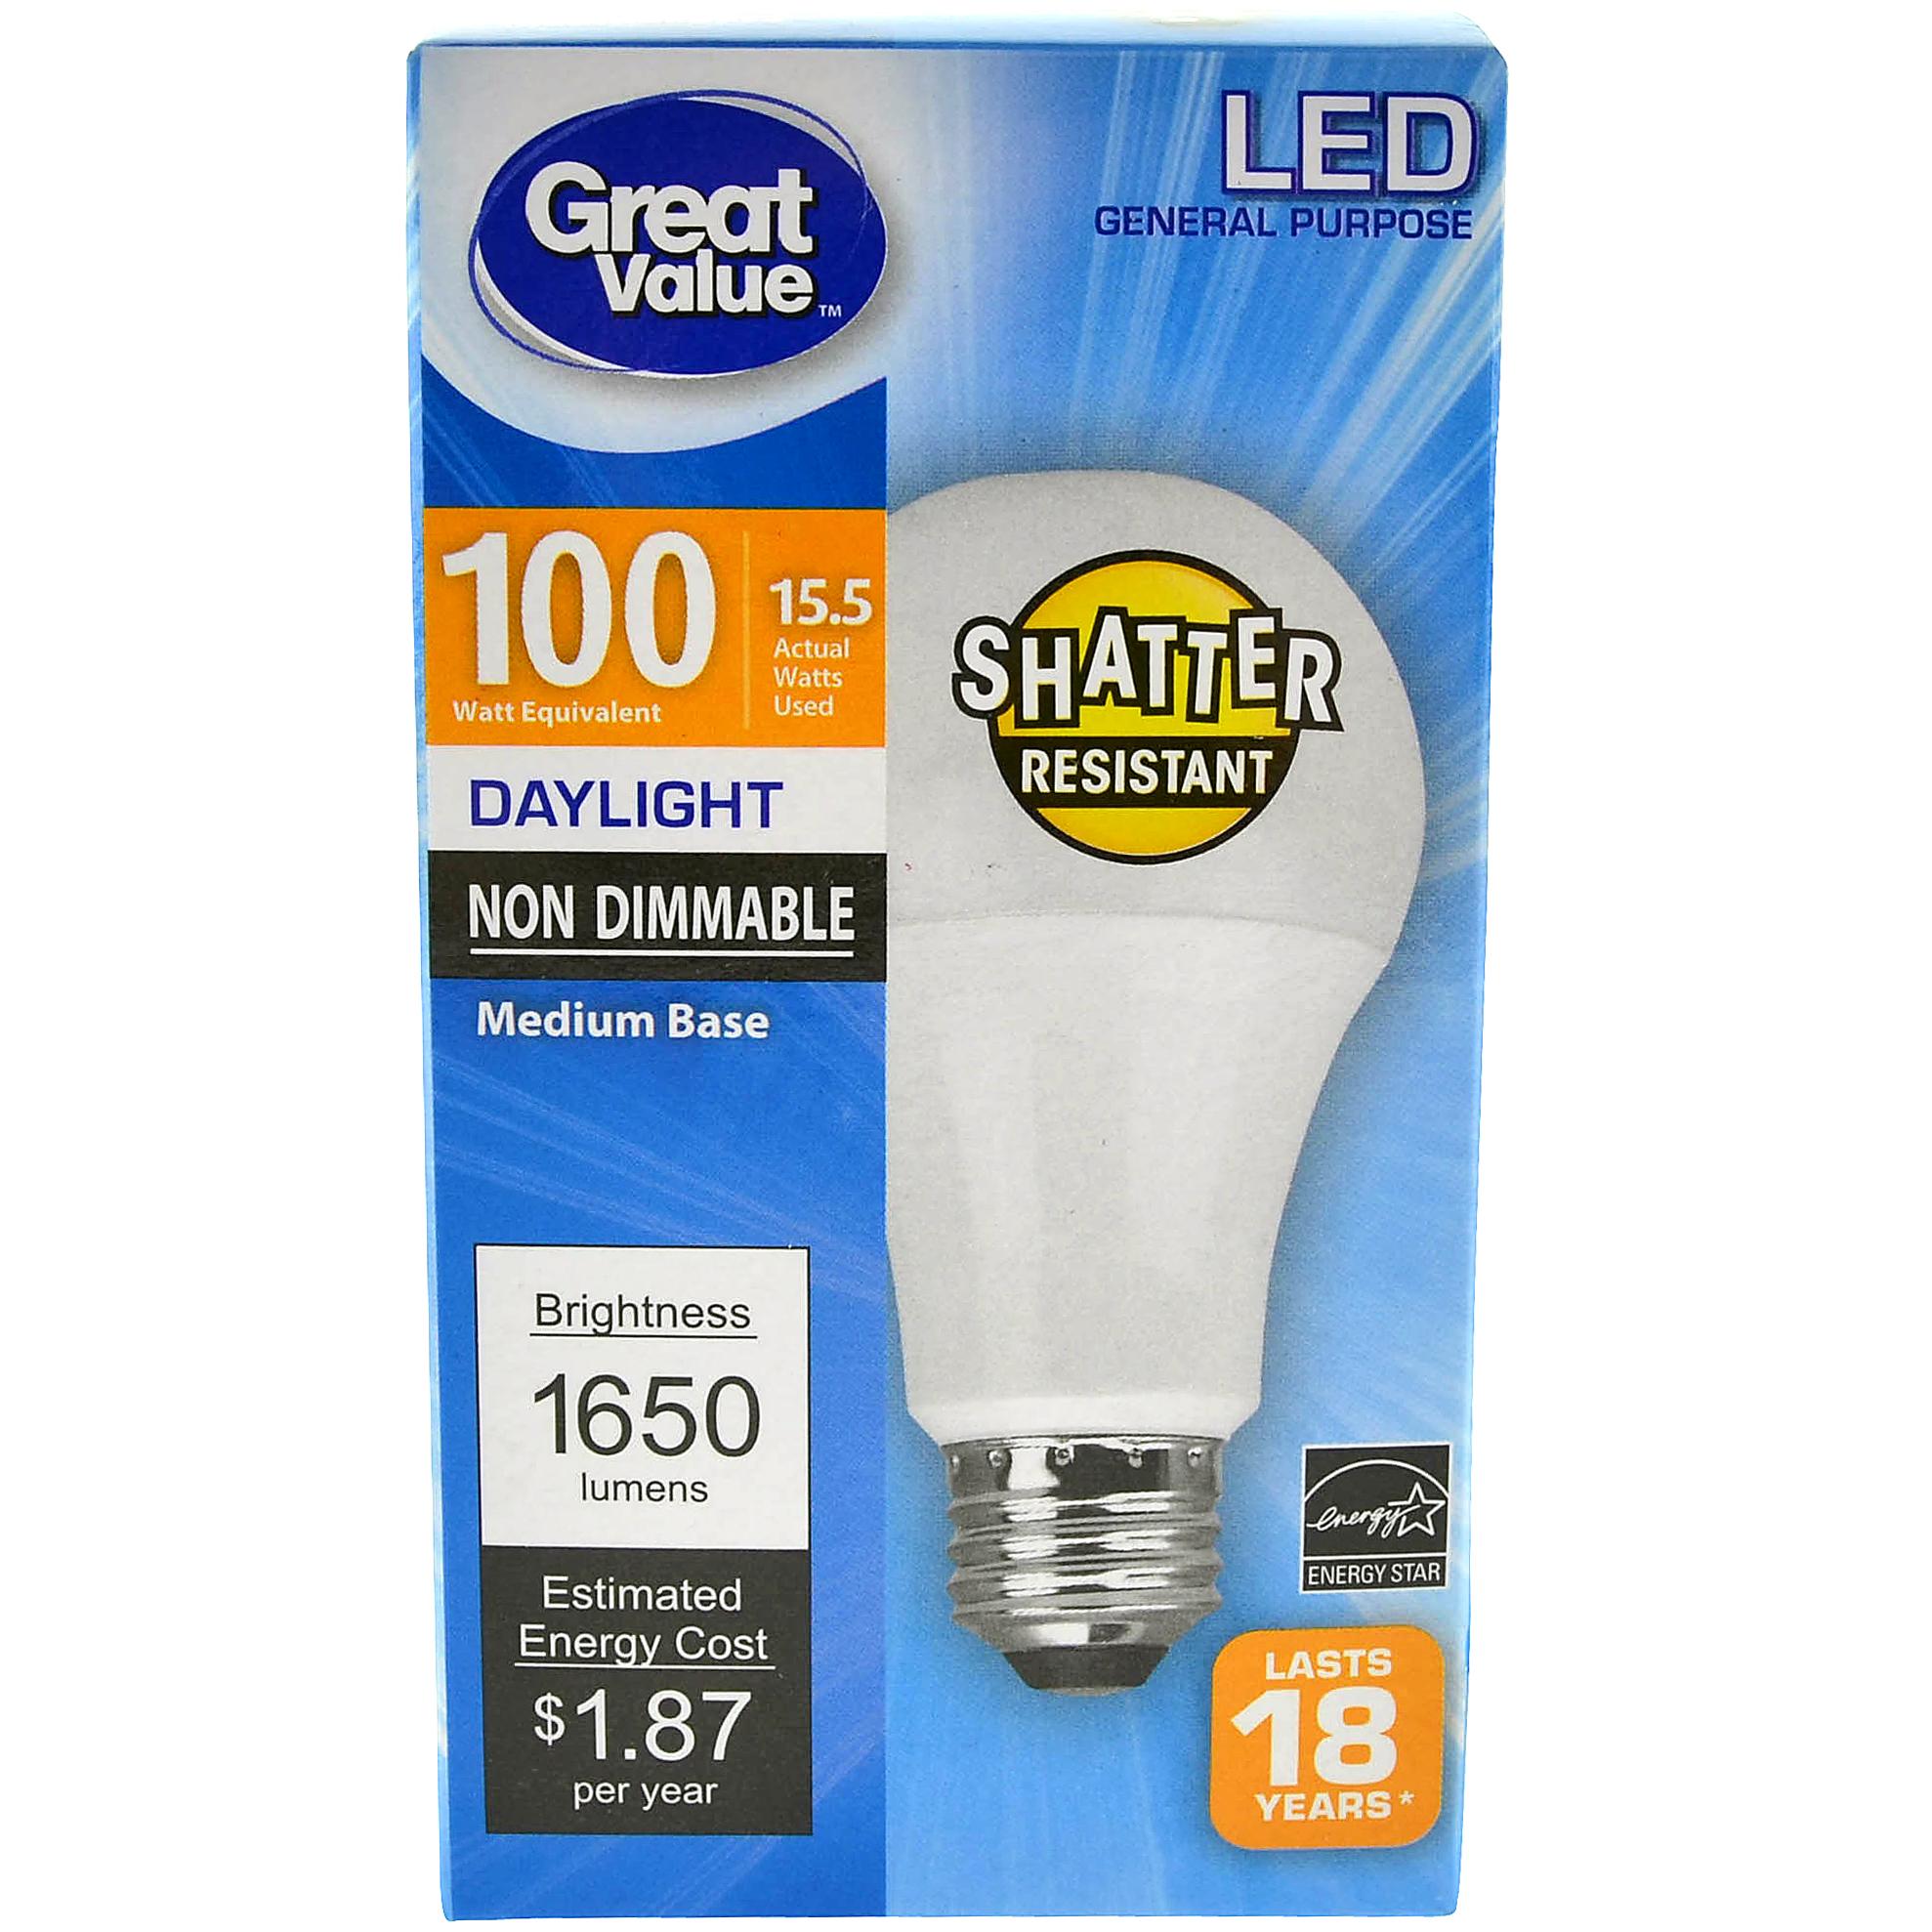 Great Value LED General Purpose (E26) Light Bulb, 16W (100W Equivalent), Daylight